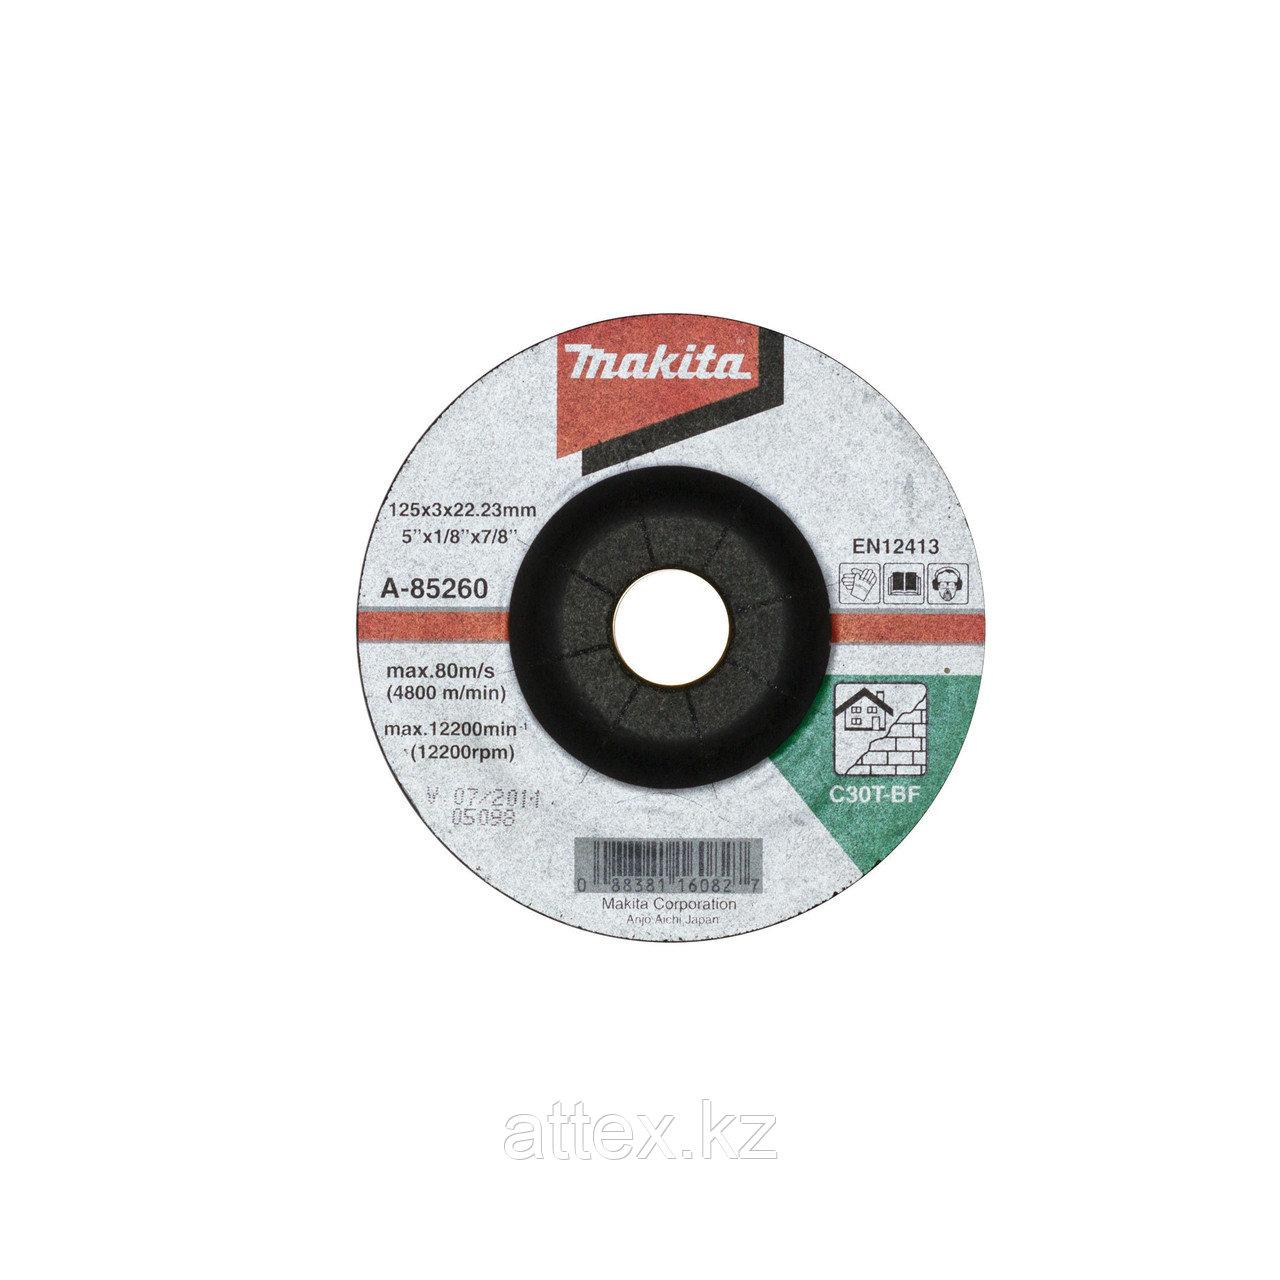 Отрезной диск по кирпичу Makita C30T-BF 230x3 мм